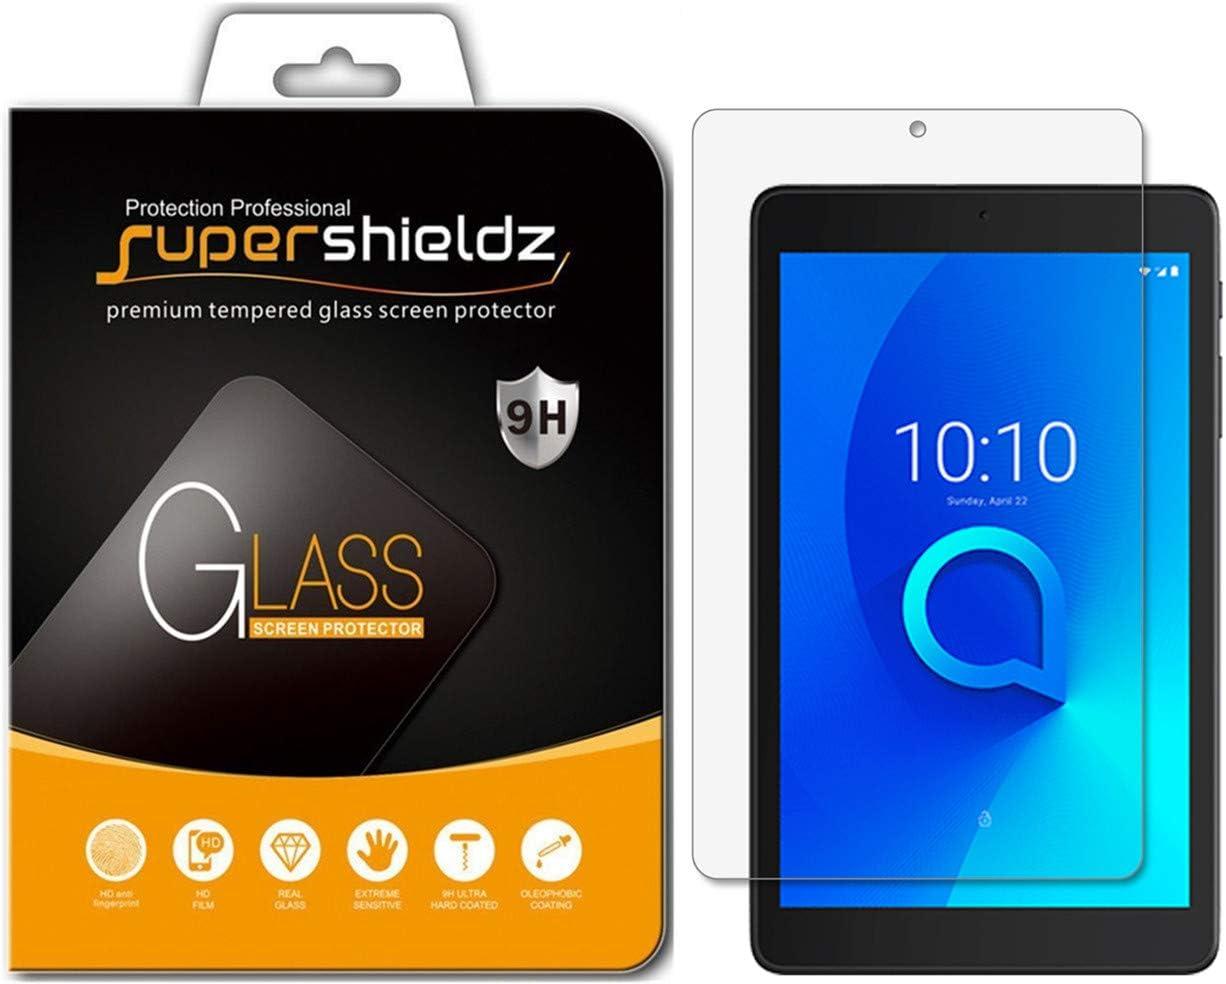 (2 Pack) Supershieldz Designed for Alcatel Joy Tab/Joy Tab 2 / Joy Tab Kids and Alcatel 3T (8 inch) Tempered Glass Screen Protector, Anti Scratch, Bubble Free